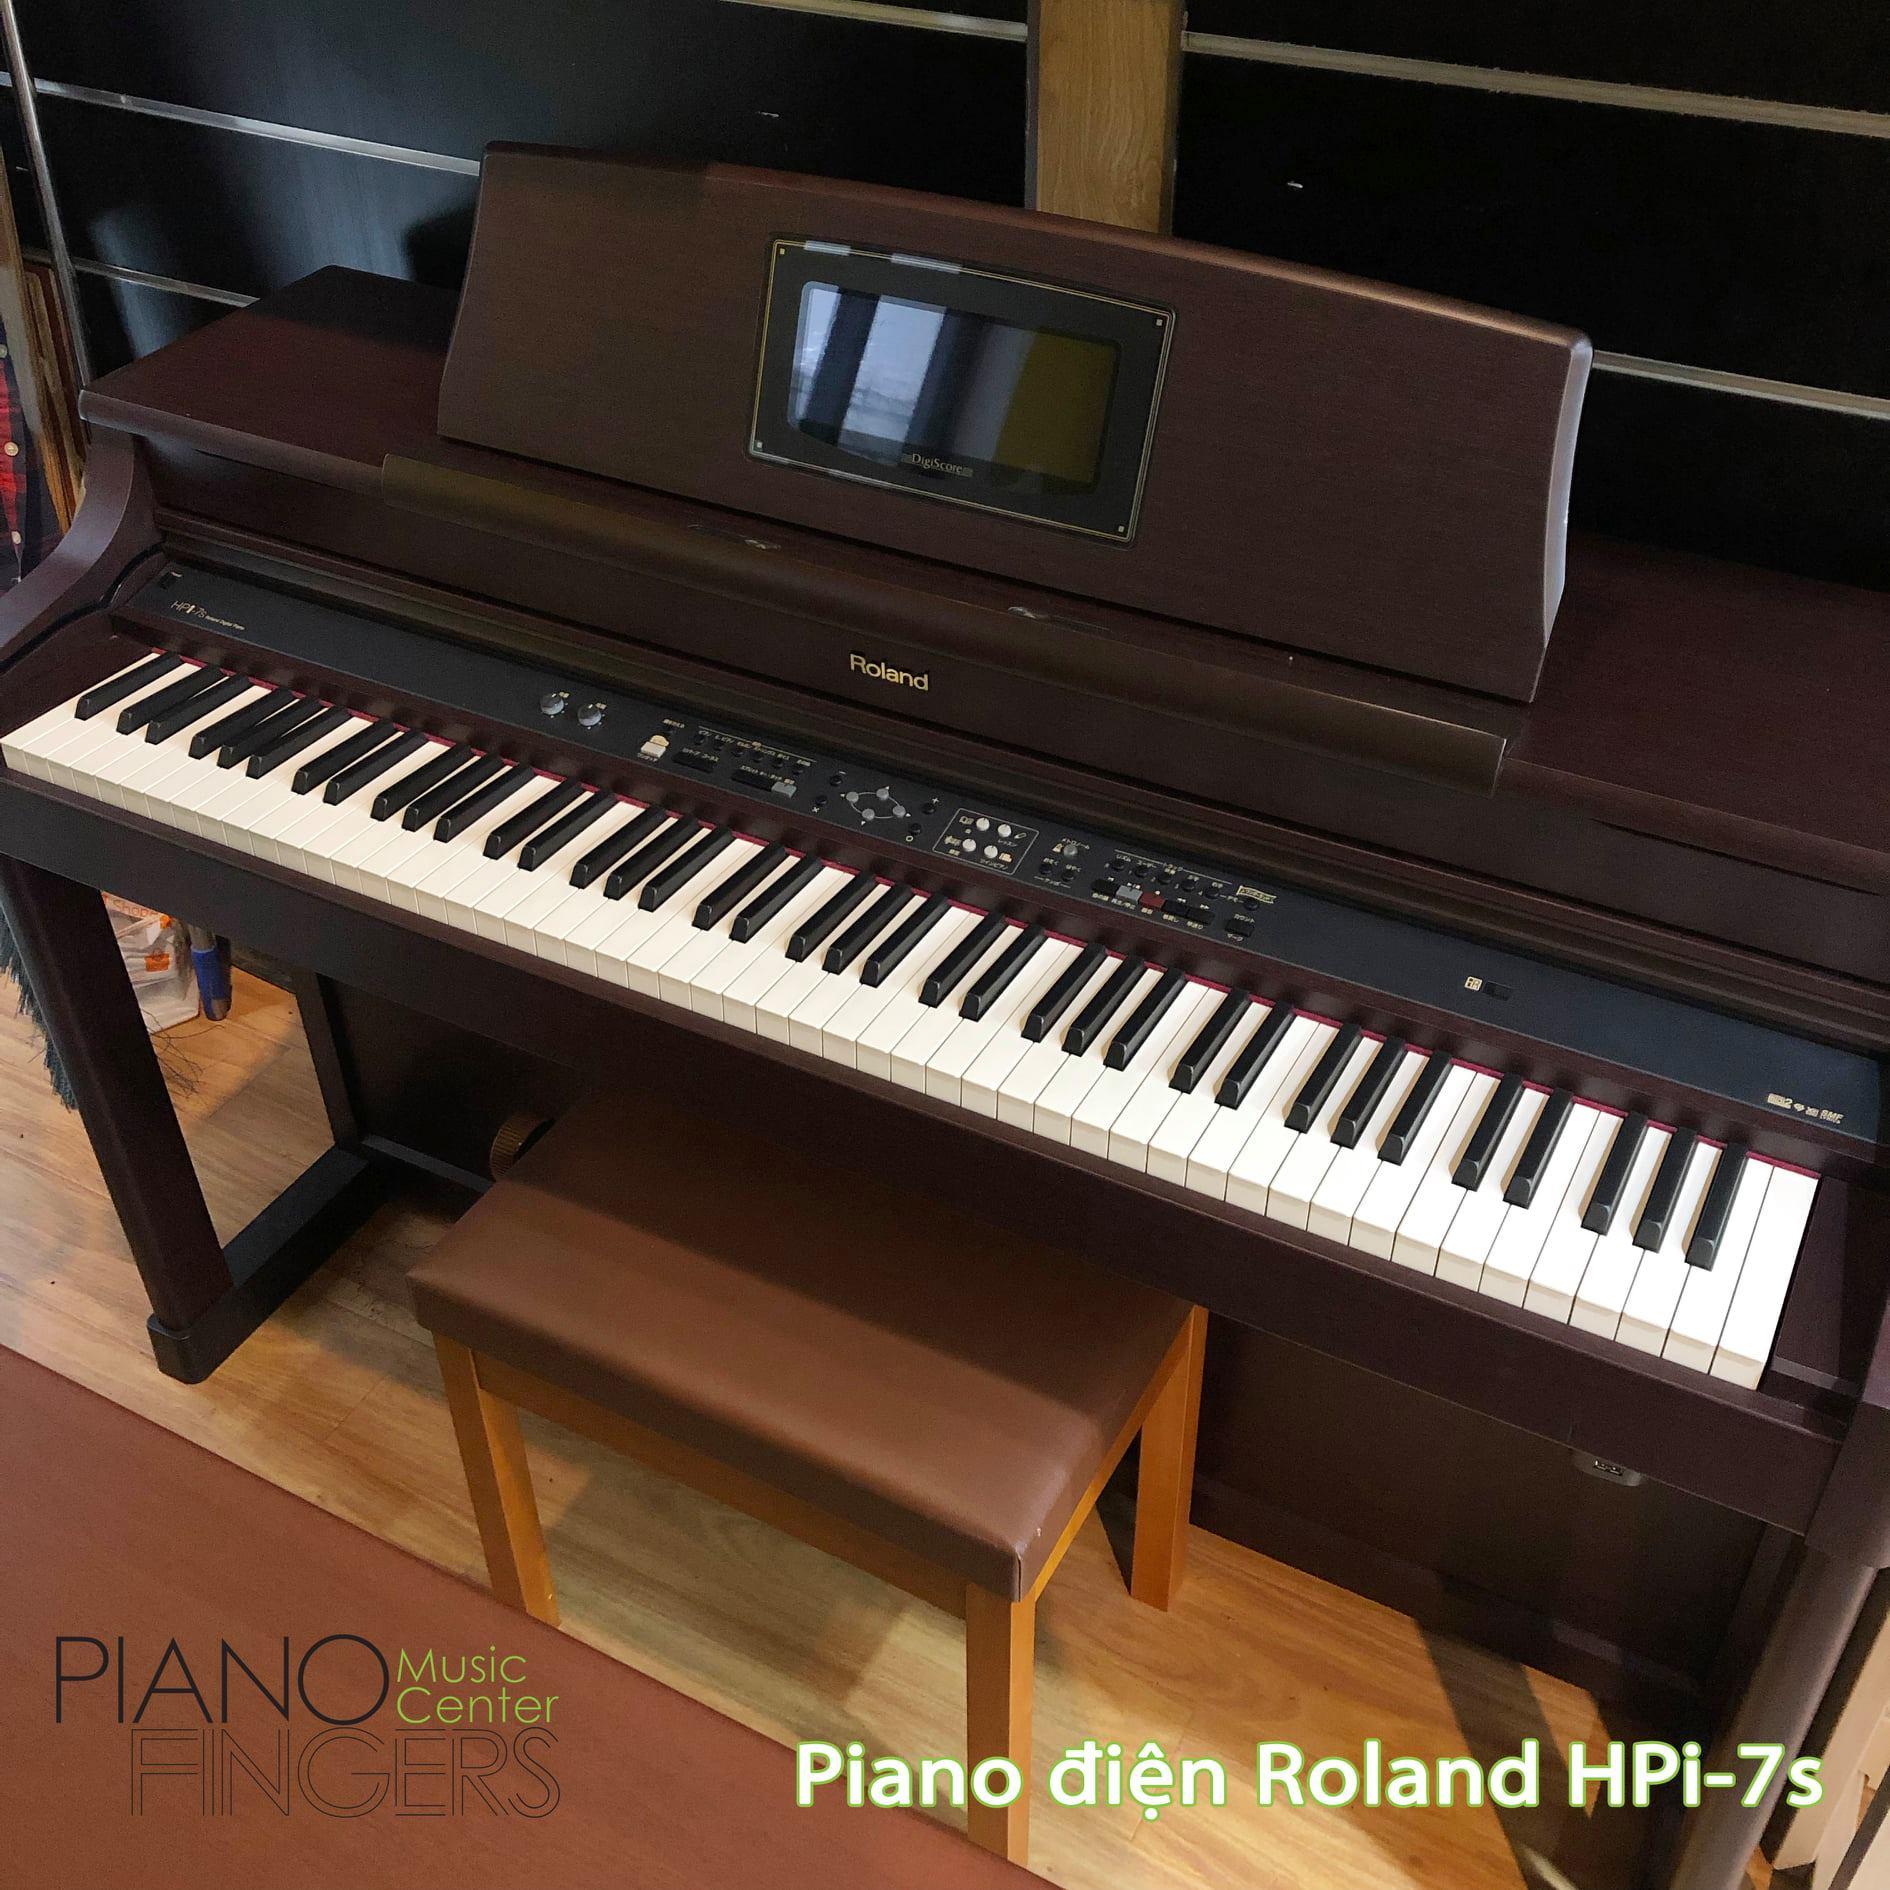 đàn piano điện roland hpi-7s piano fingers 4